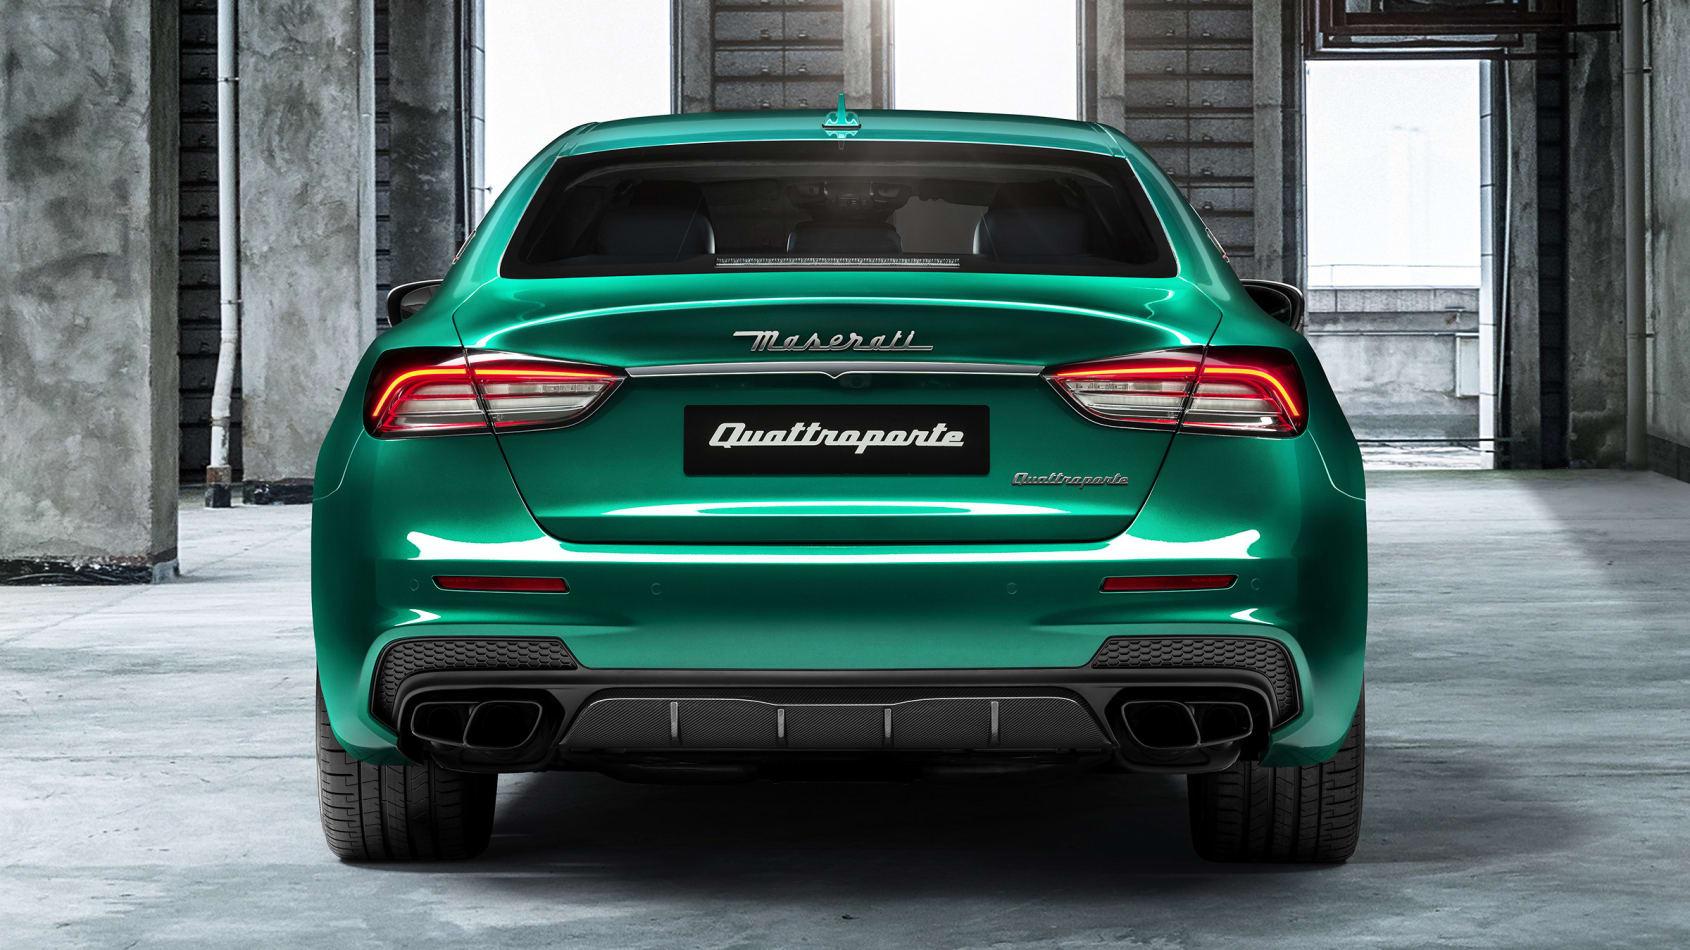 [Image: Maserati%20Quattroporte%20Trofeo-3.jpg]